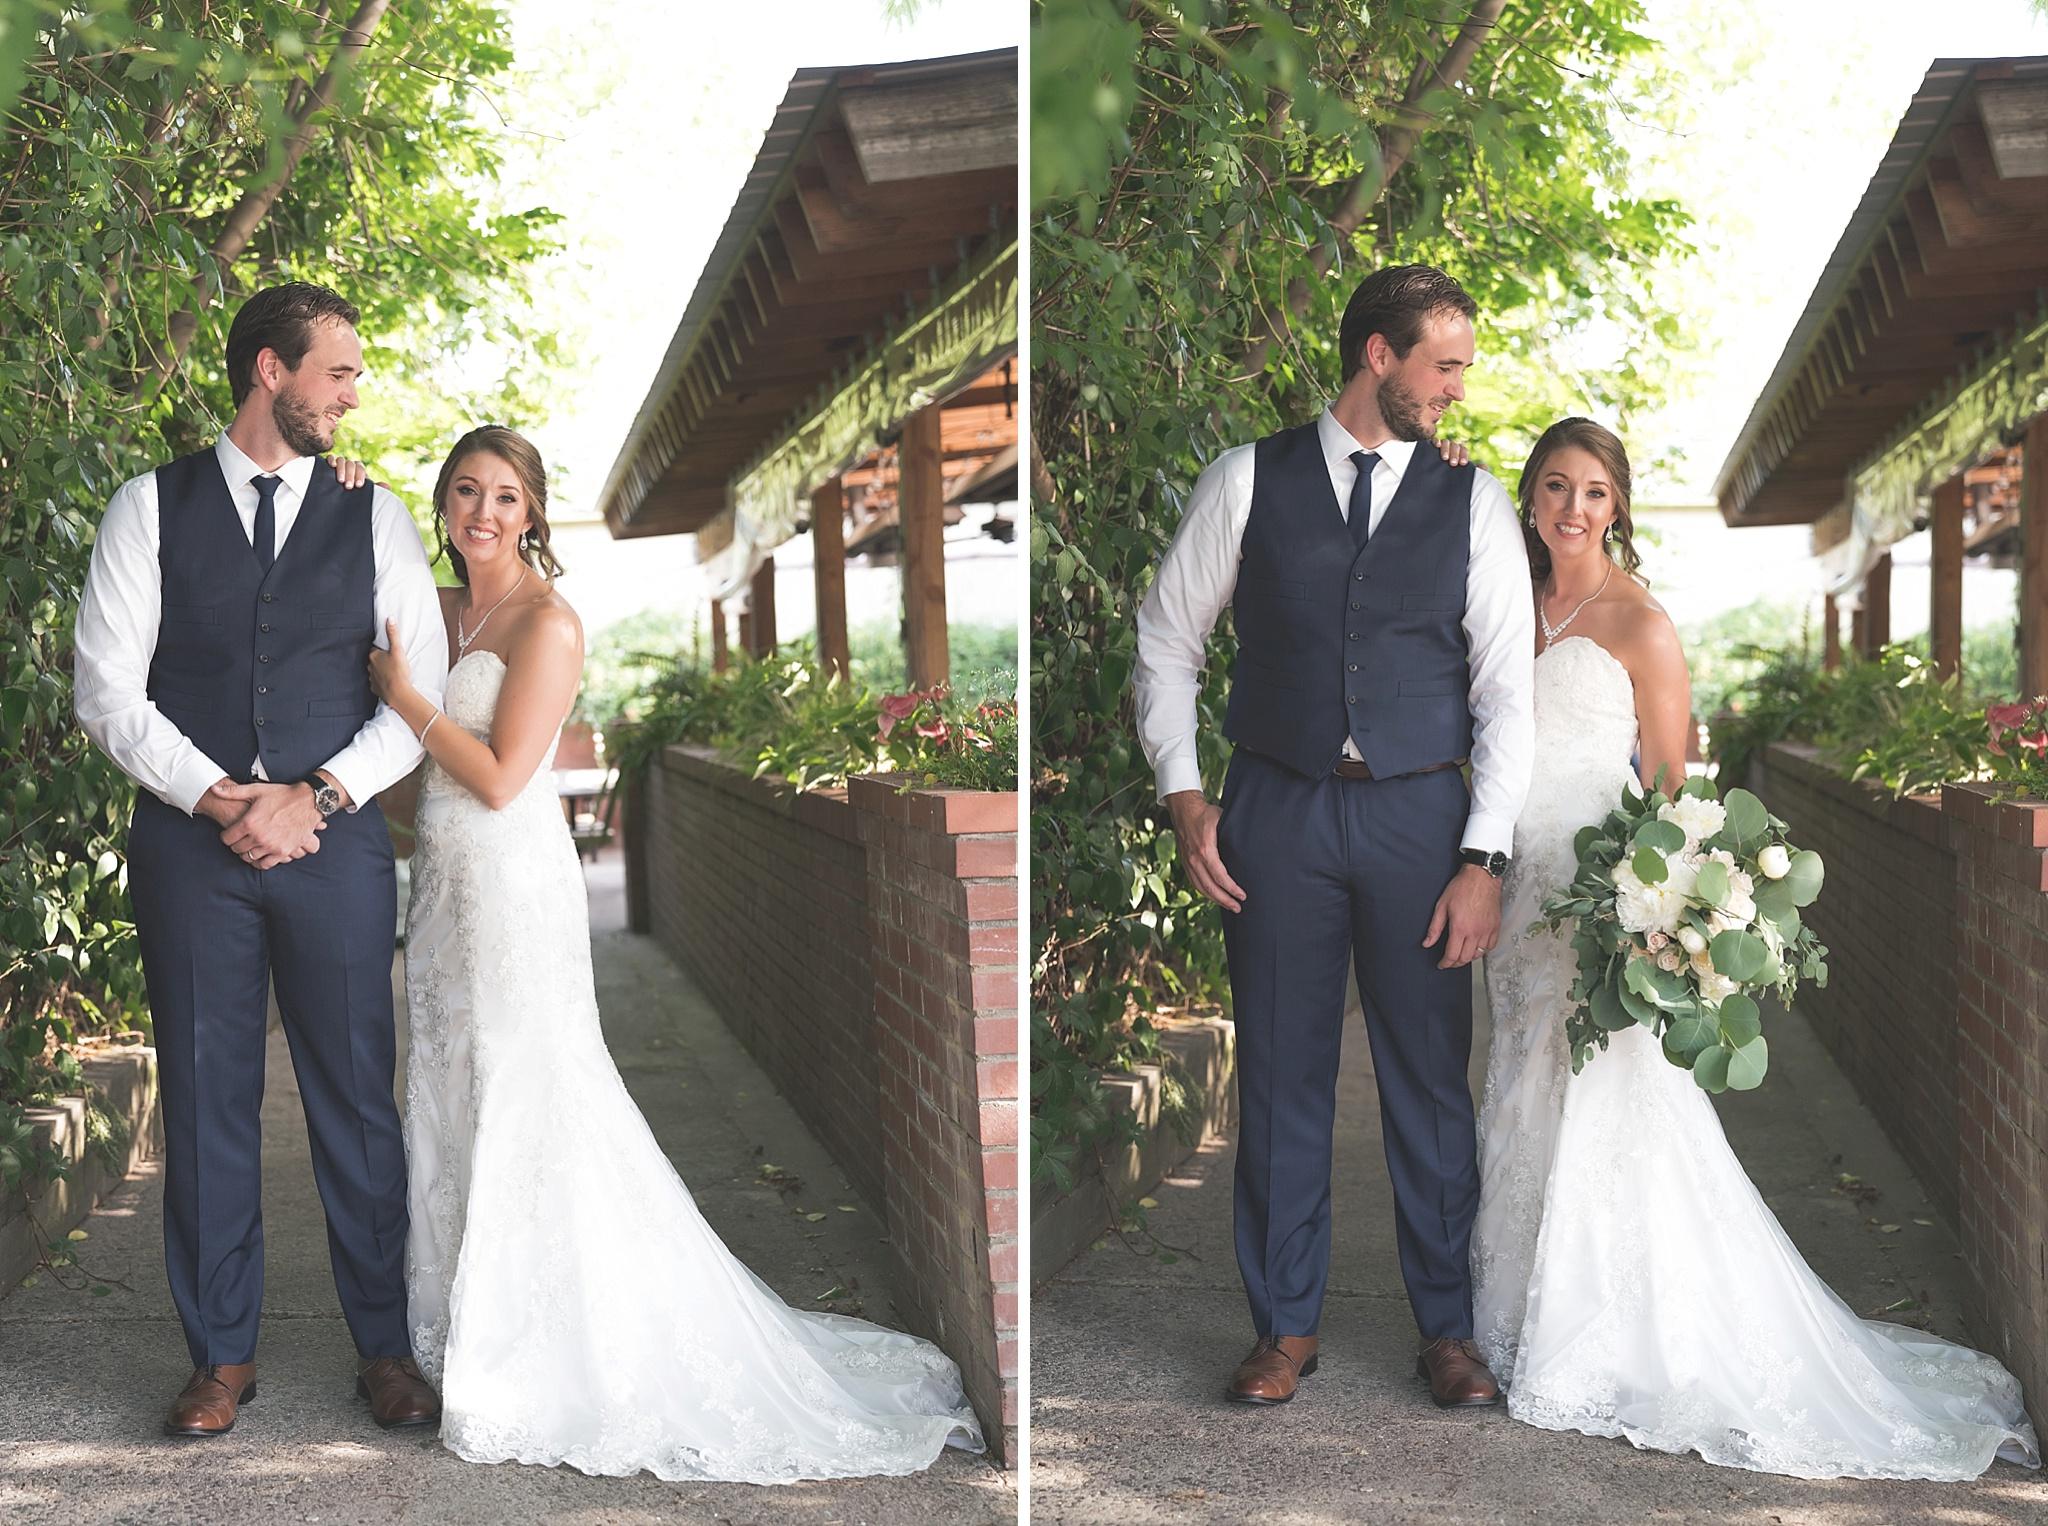 Rickhouse-Durham-NC-Wedding-Photographer-051.jpg